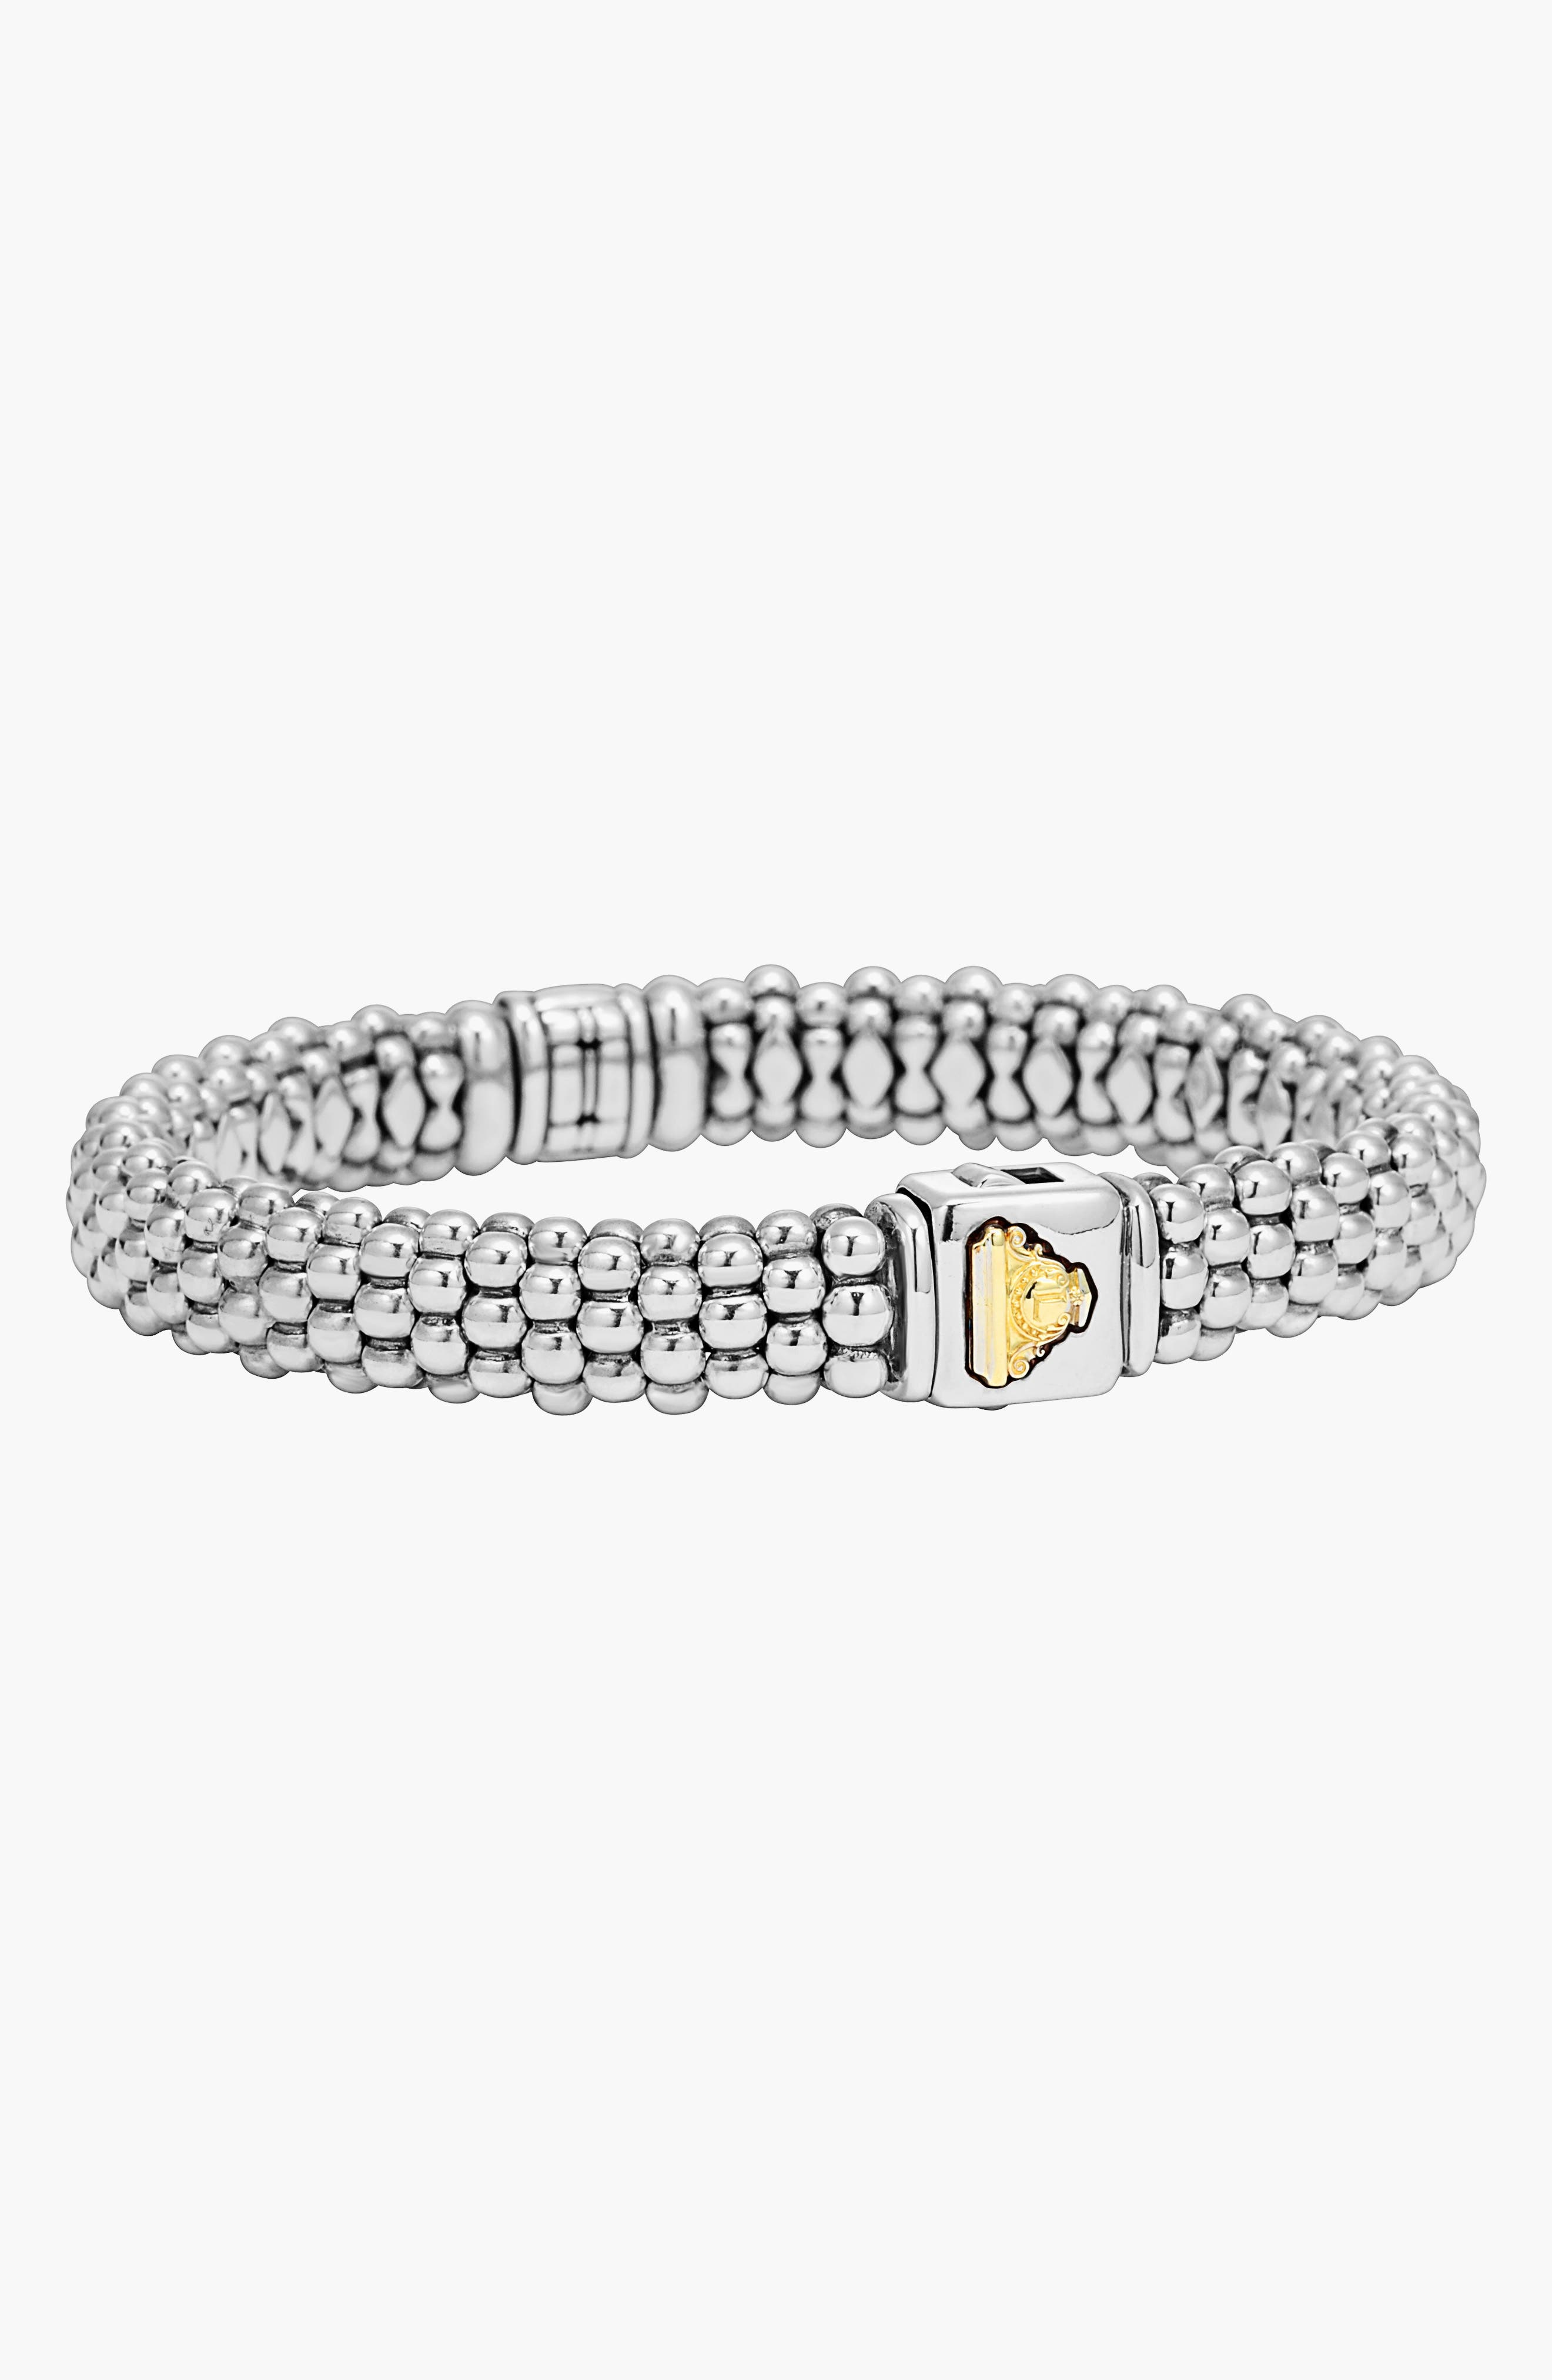 Caviar & Diamond Bracelet,                             Alternate thumbnail 6, color,                             STERLING SILVER/ GOLD